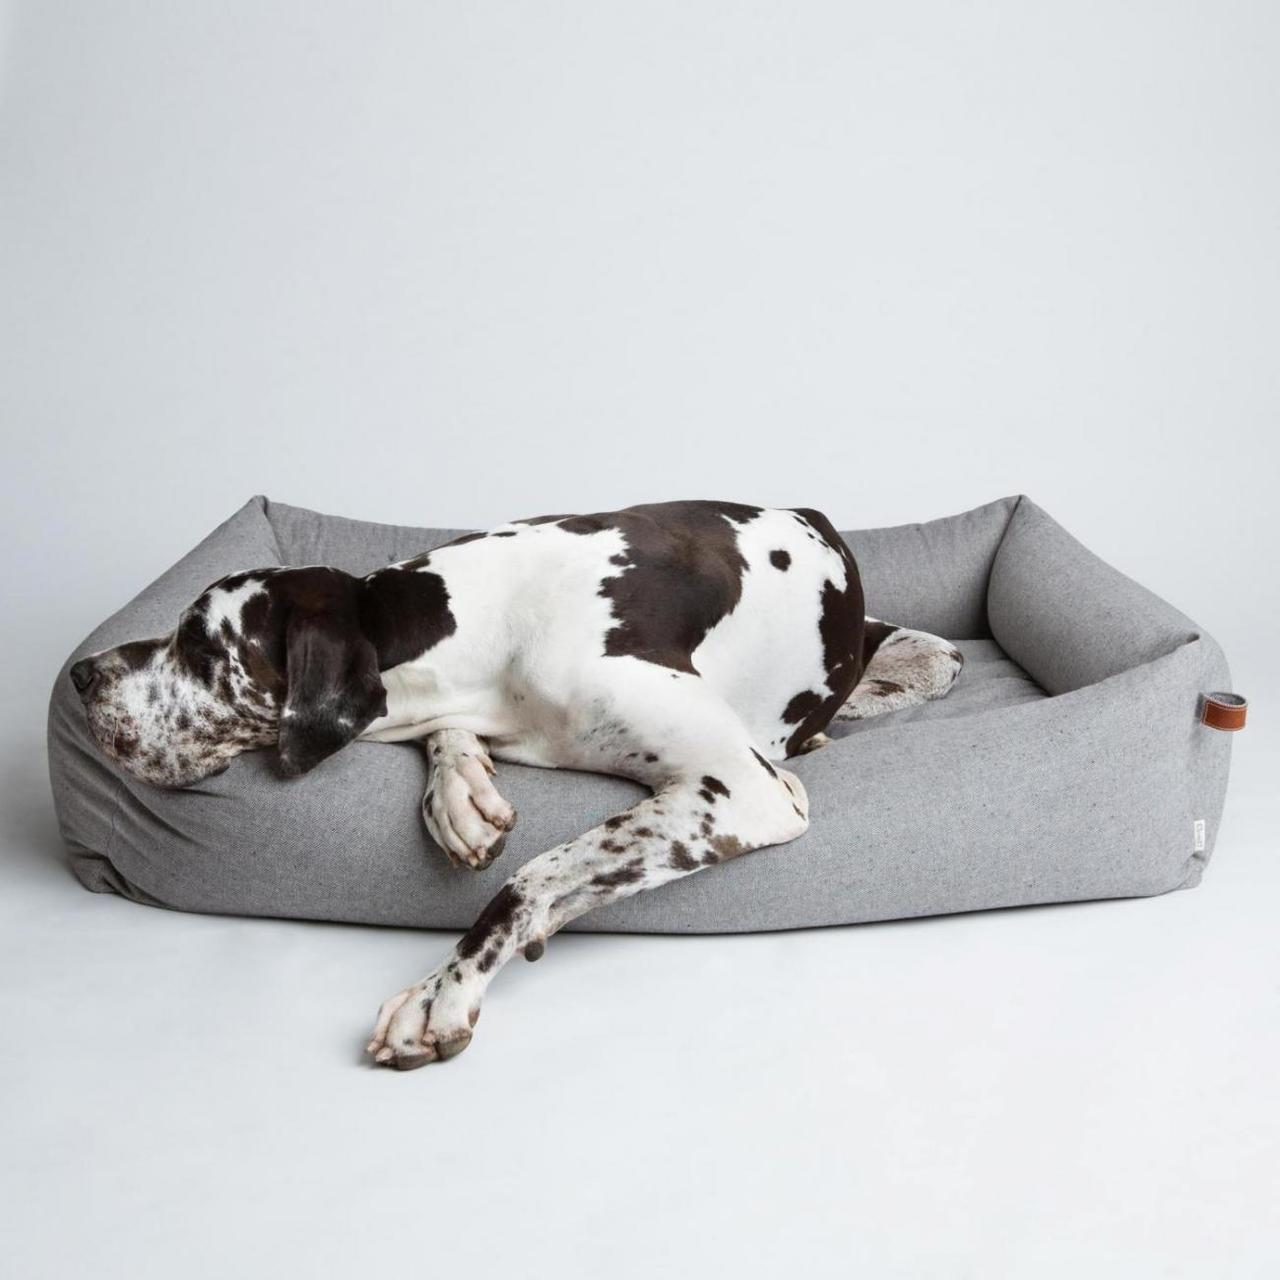 cloud7 betten zampetta hundeboutique hundesalon. Black Bedroom Furniture Sets. Home Design Ideas